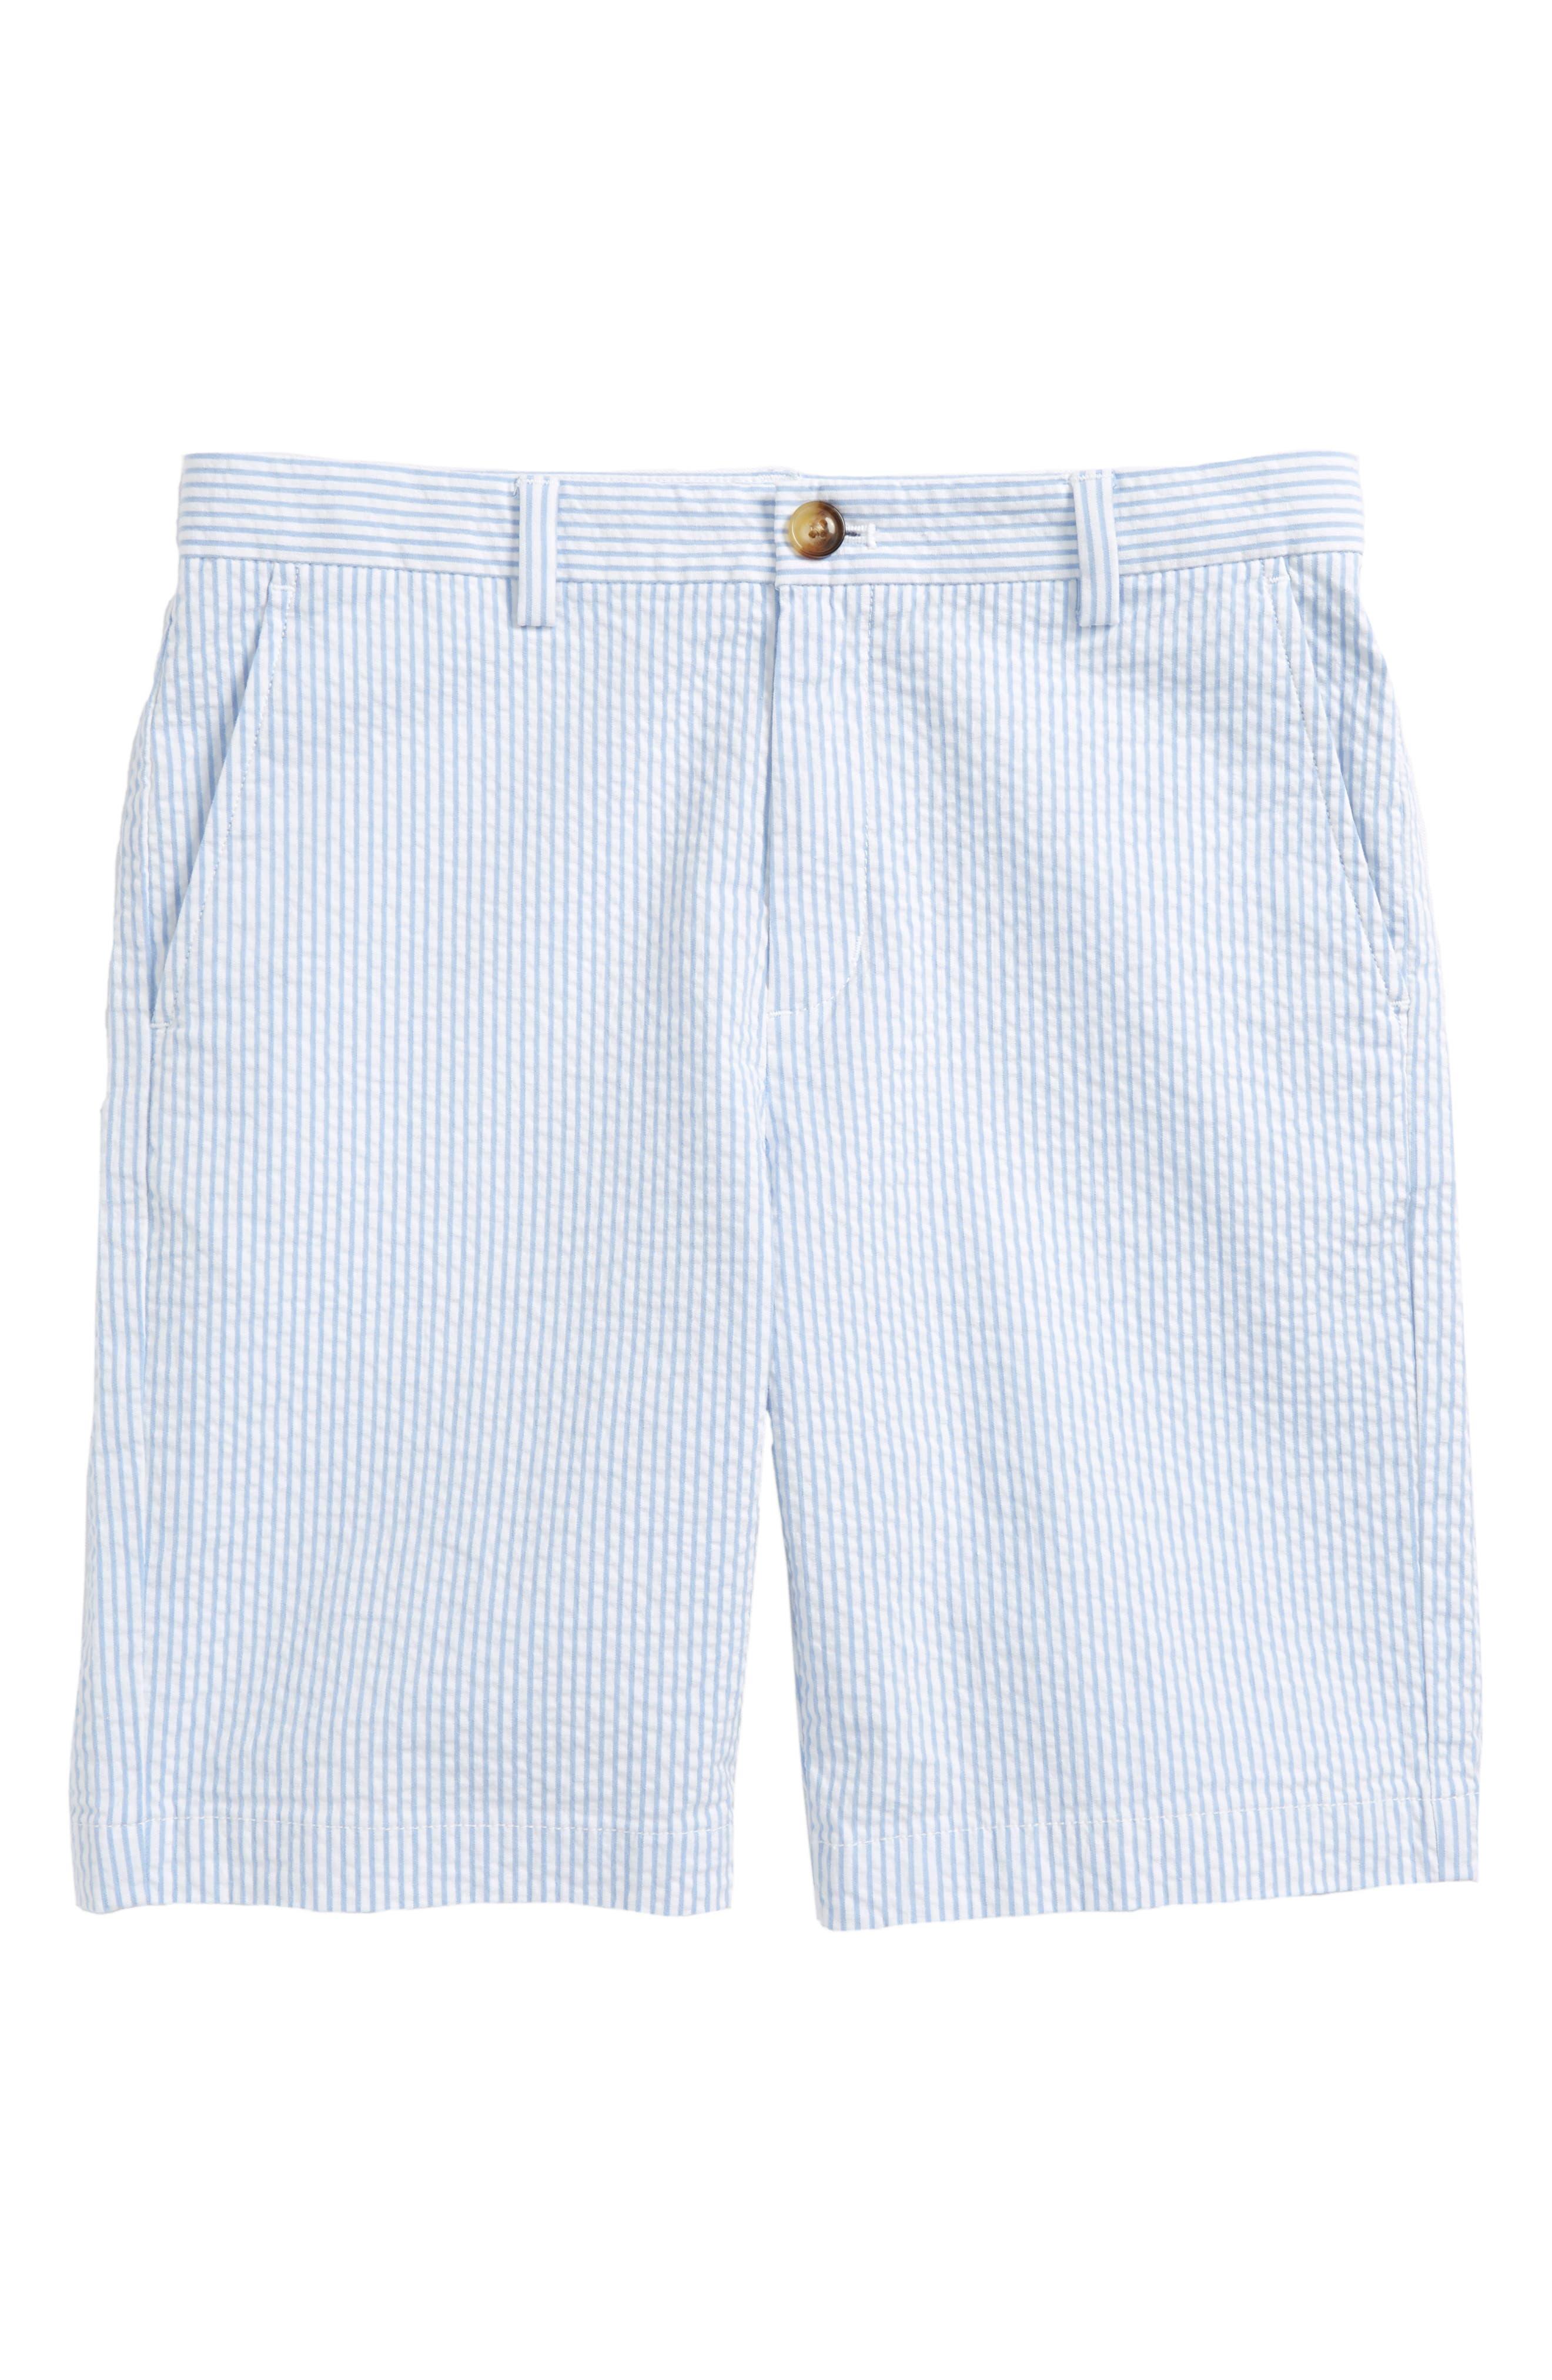 Seersucker Stripe Breaker Shorts,                             Main thumbnail 1, color,                             484